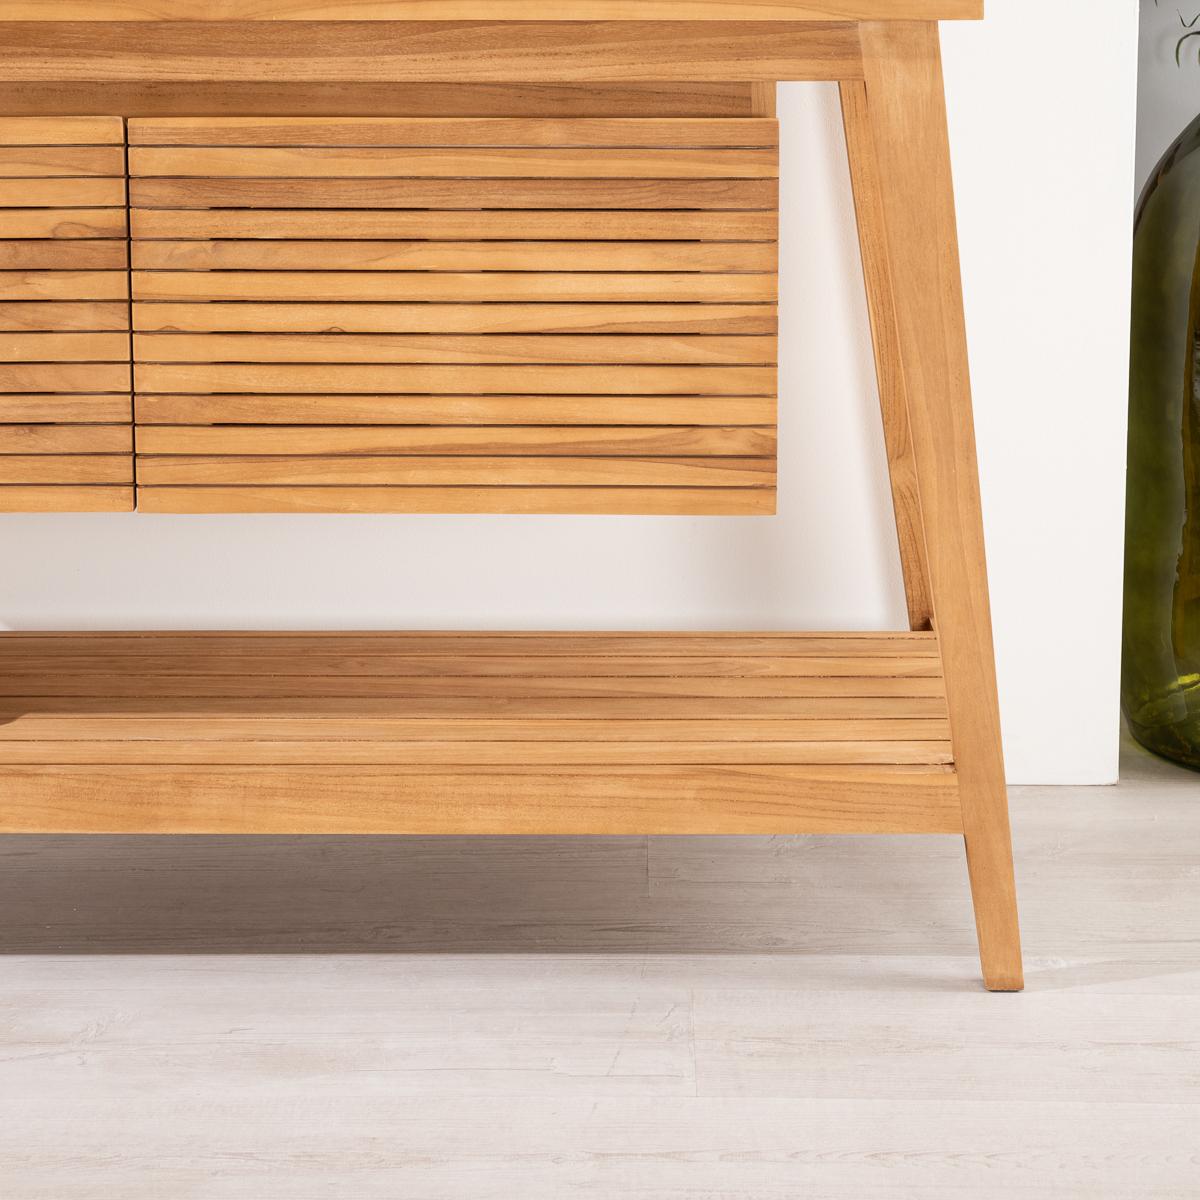 Solid Wood Teak Vanity Unit Double Sink Scandinavian Natural L 140 Cm